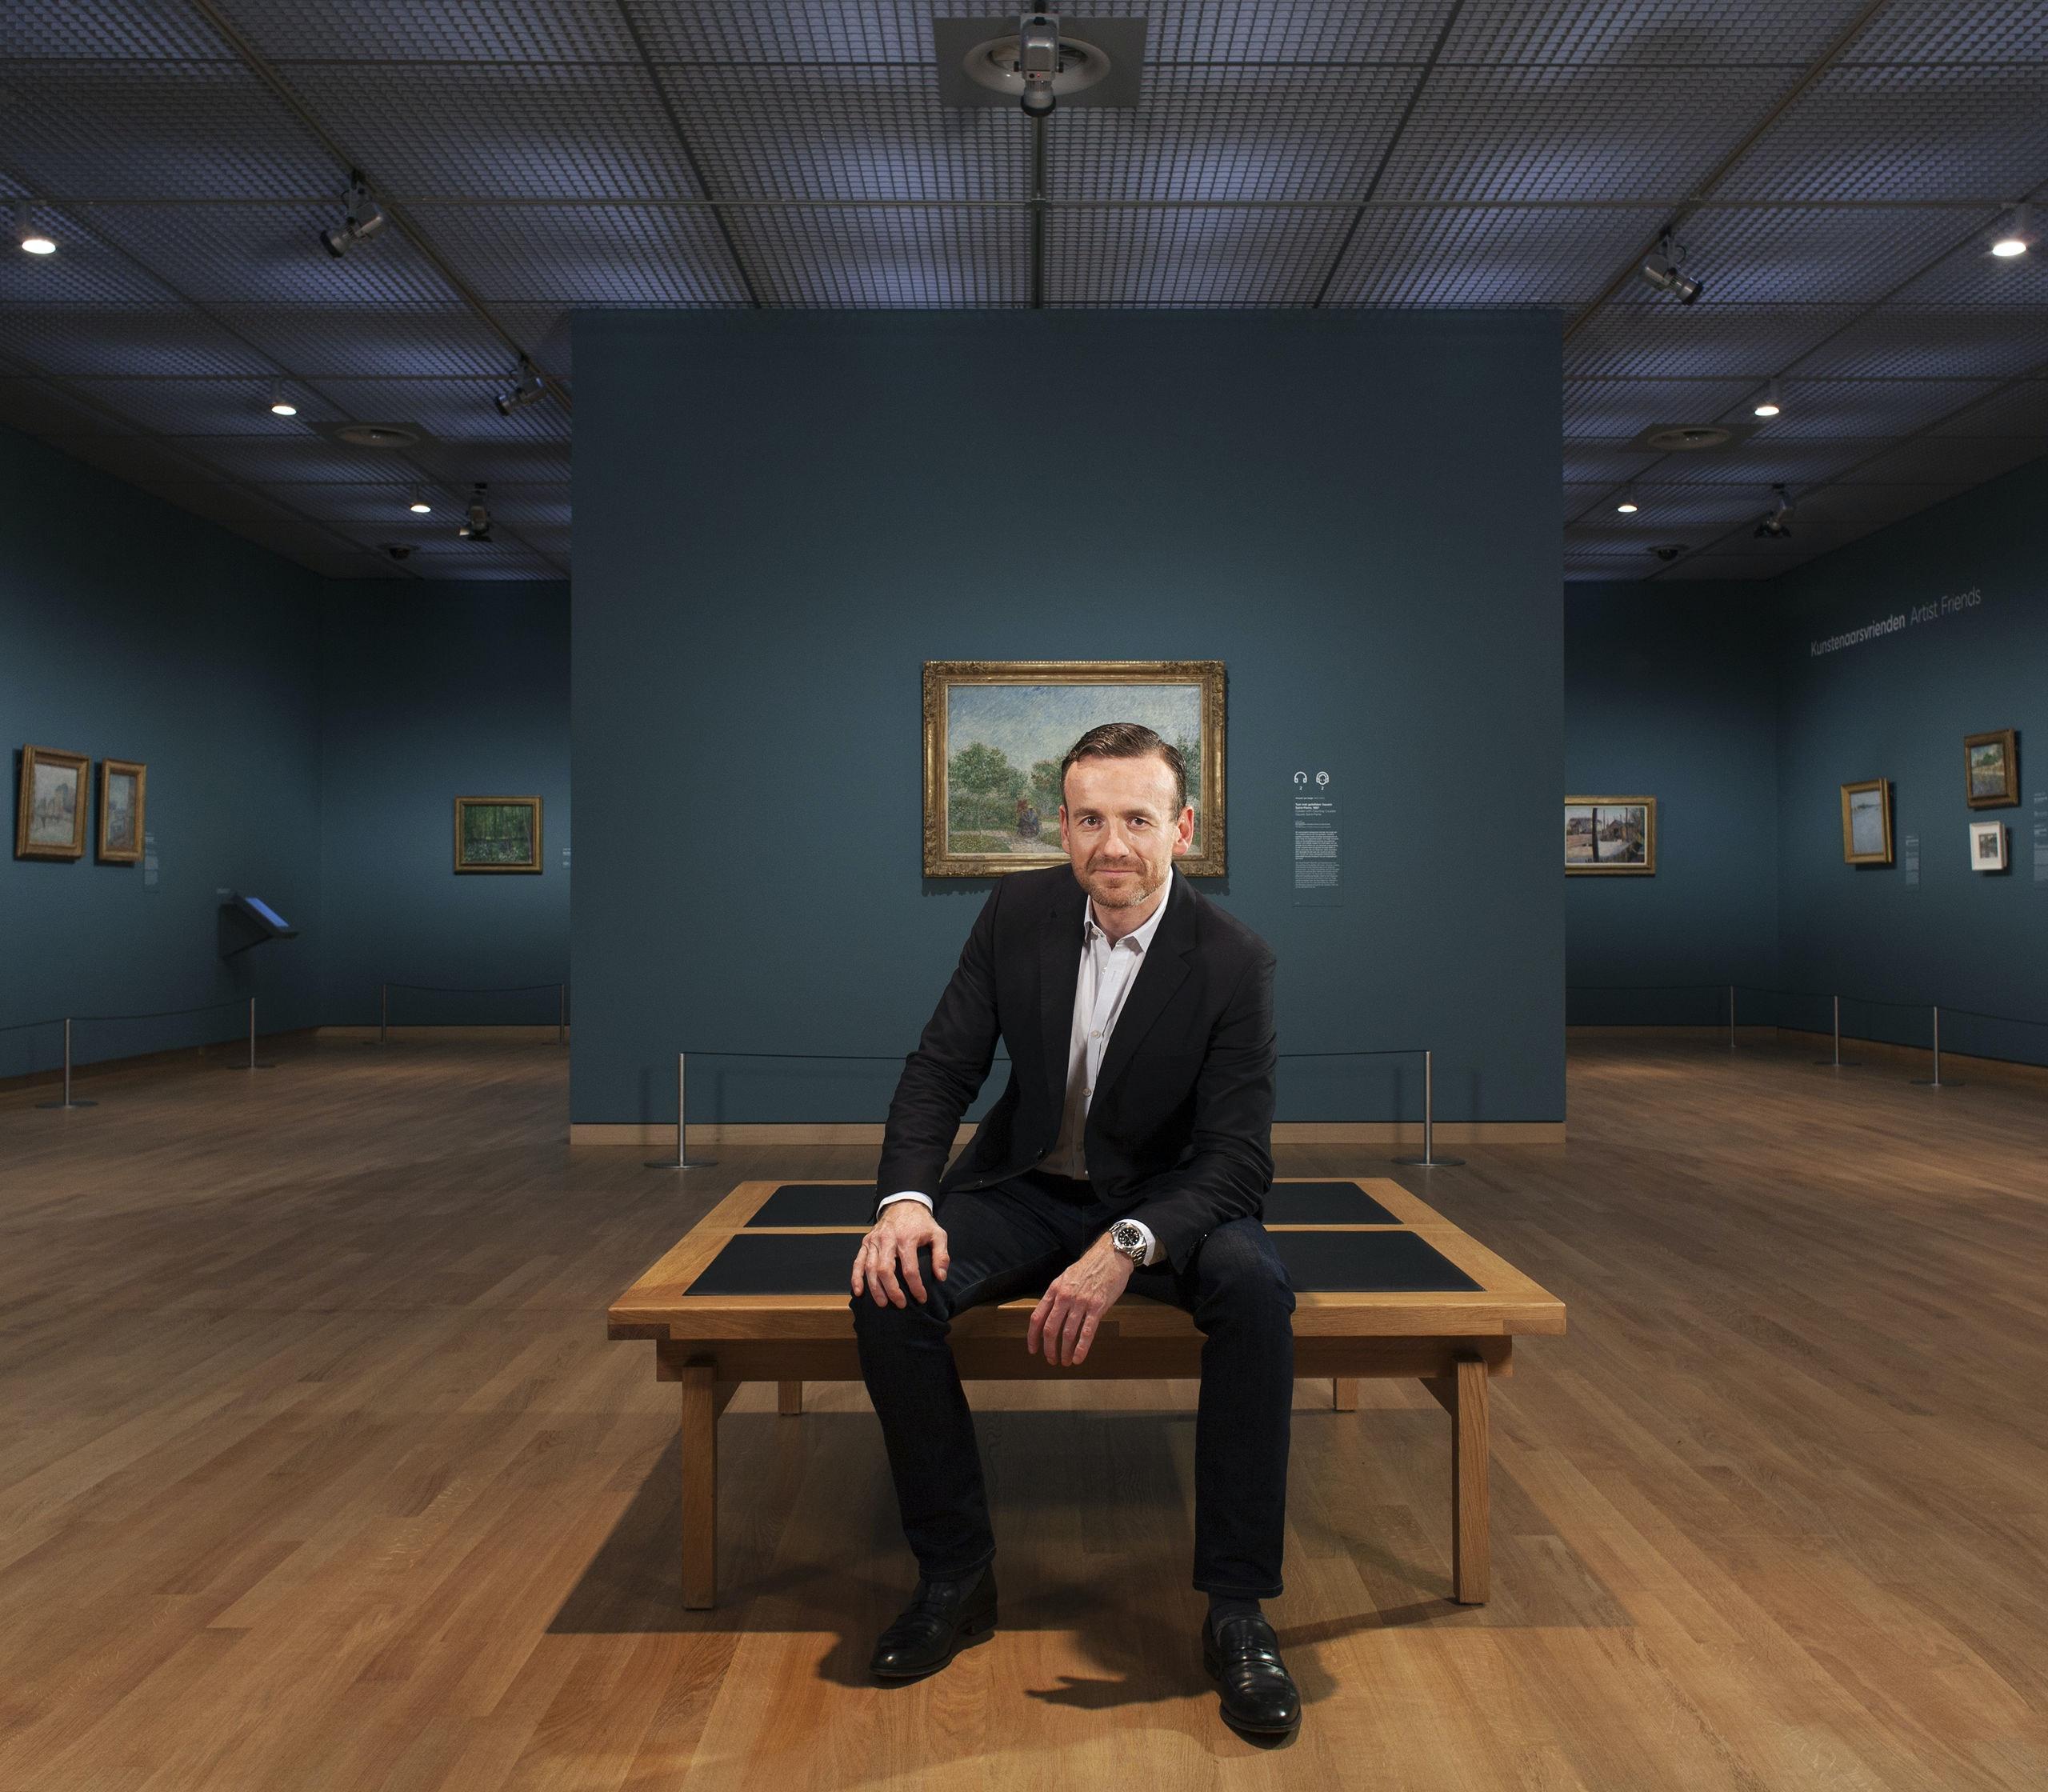 Axel Rüger directuer van Gogh Museum Amsterdam